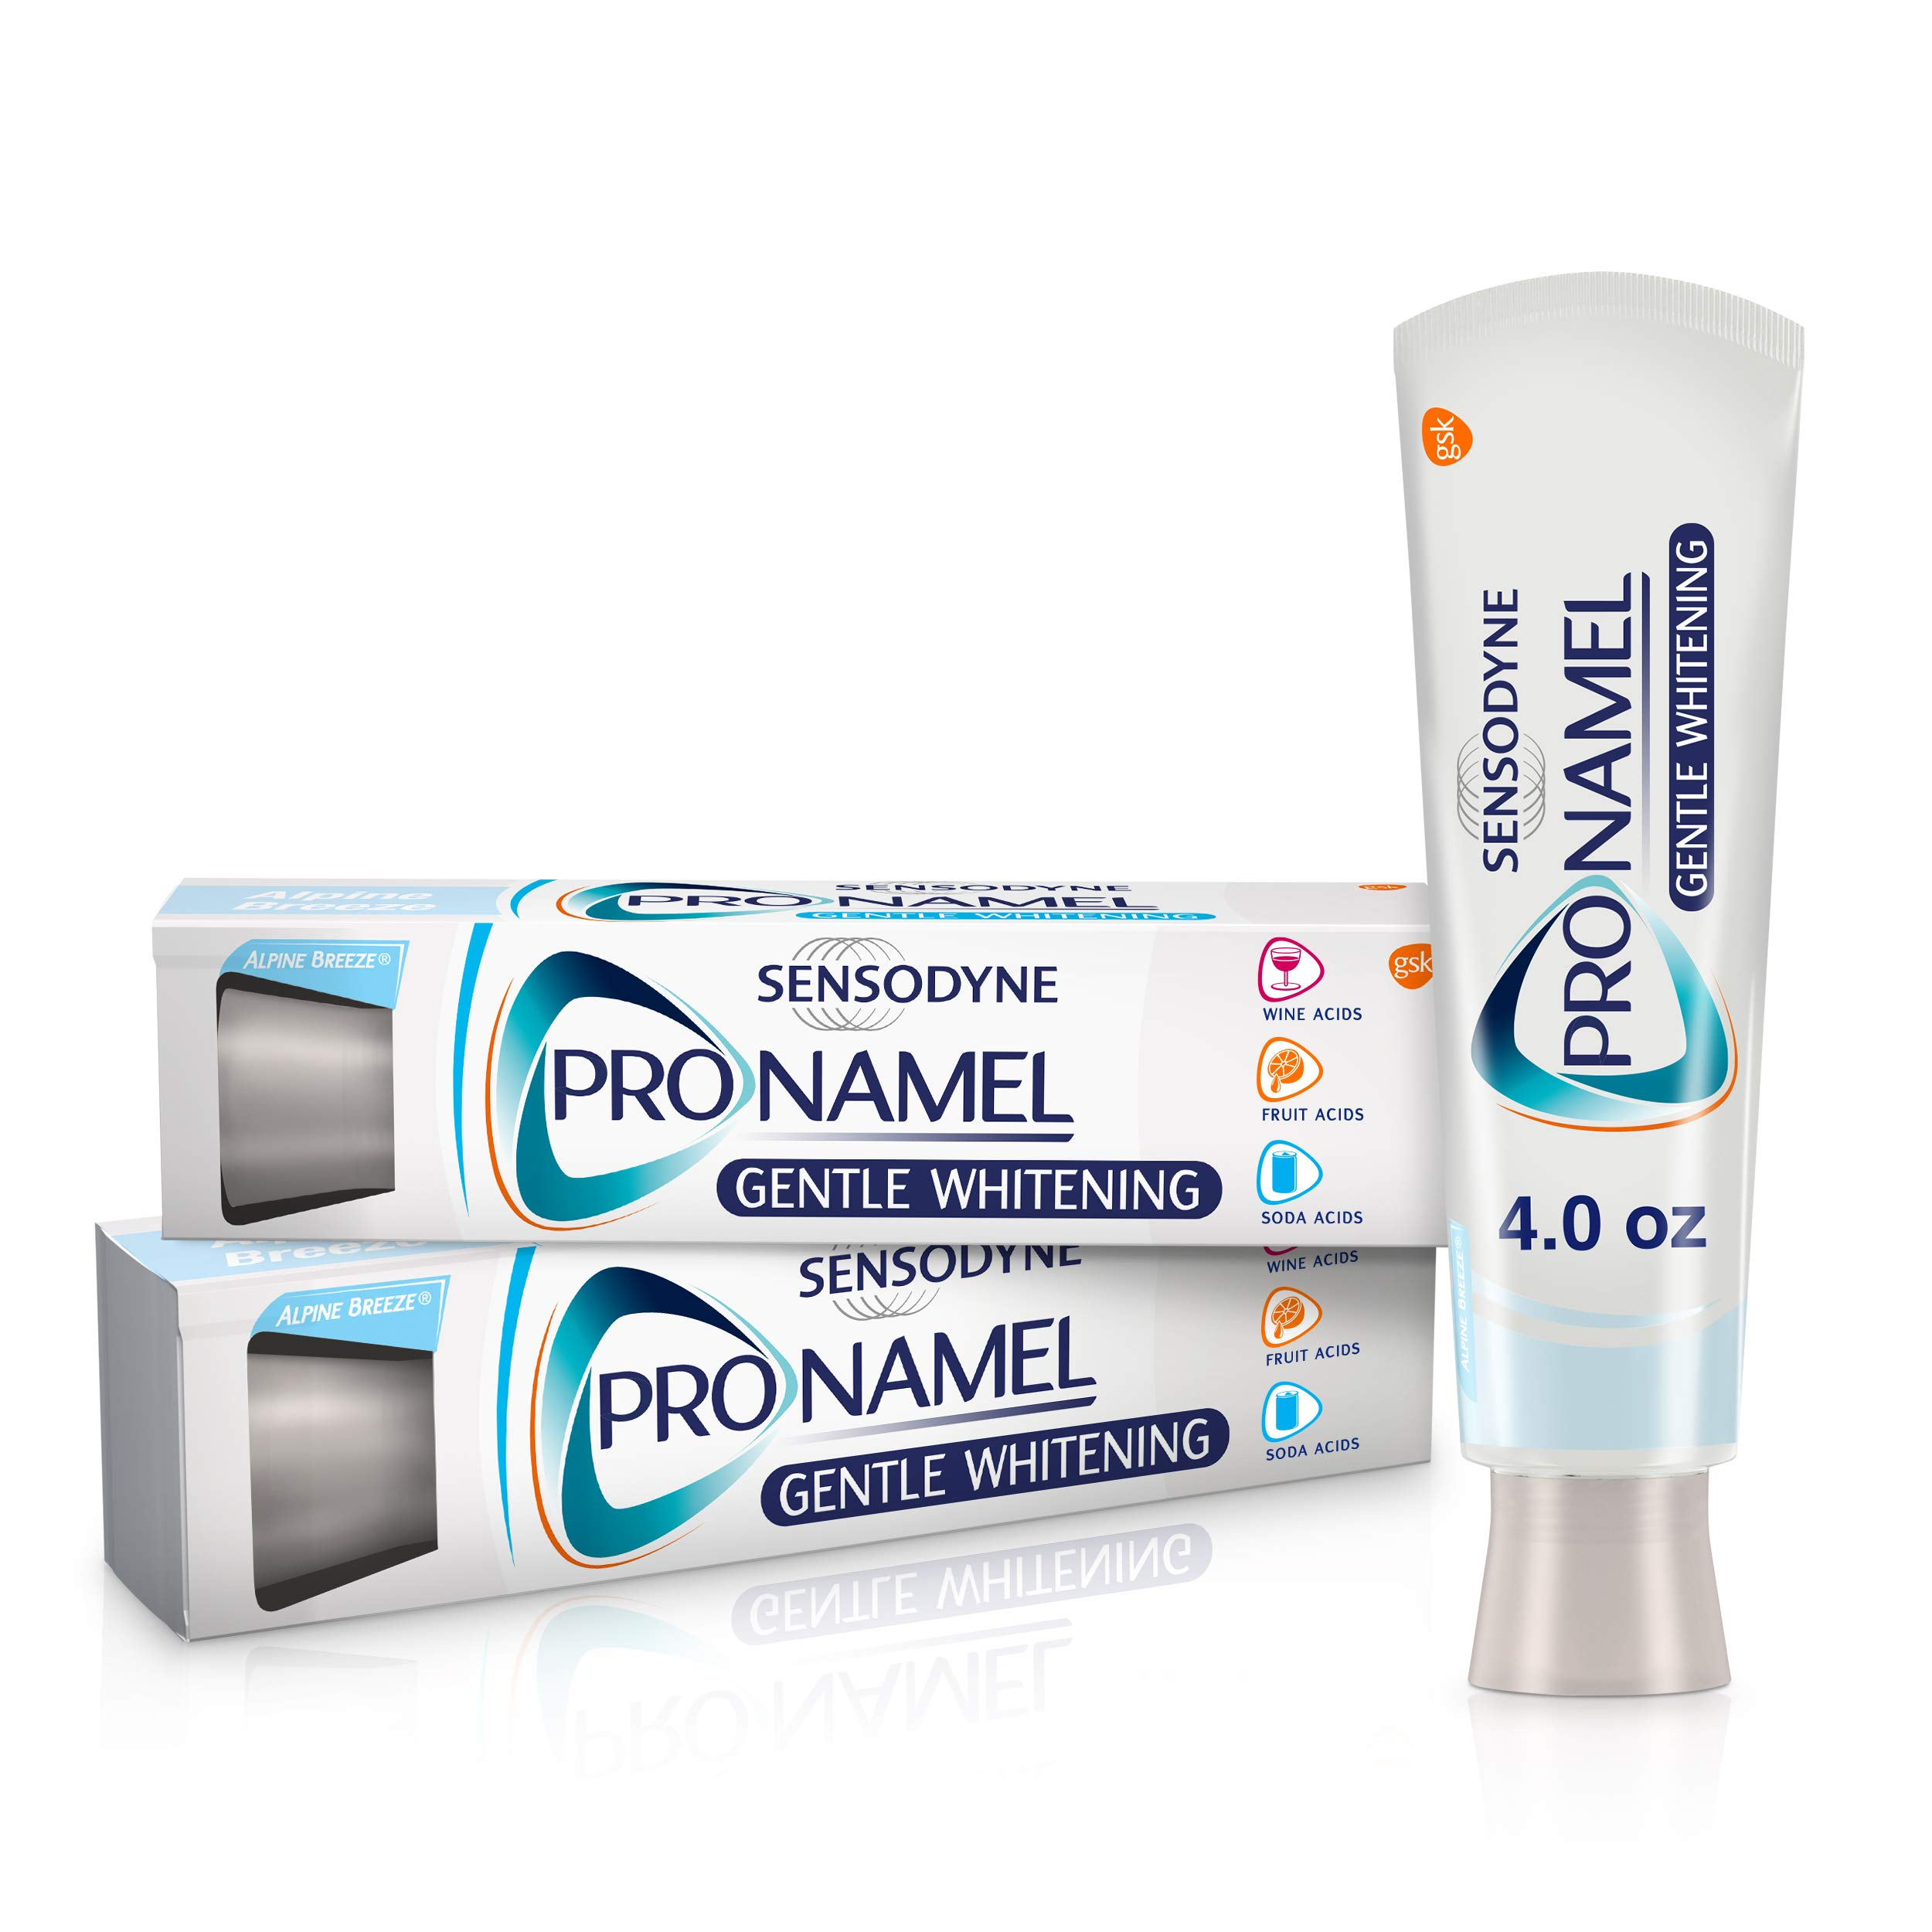 Sensodyne Pronamel Gentle Teeth Whitening Enamel Toothpaste for Sensitive Teeth, to Reharden and Strengthen Enamel, Alpine Breeze - 4 Ounces (Pack of 2)